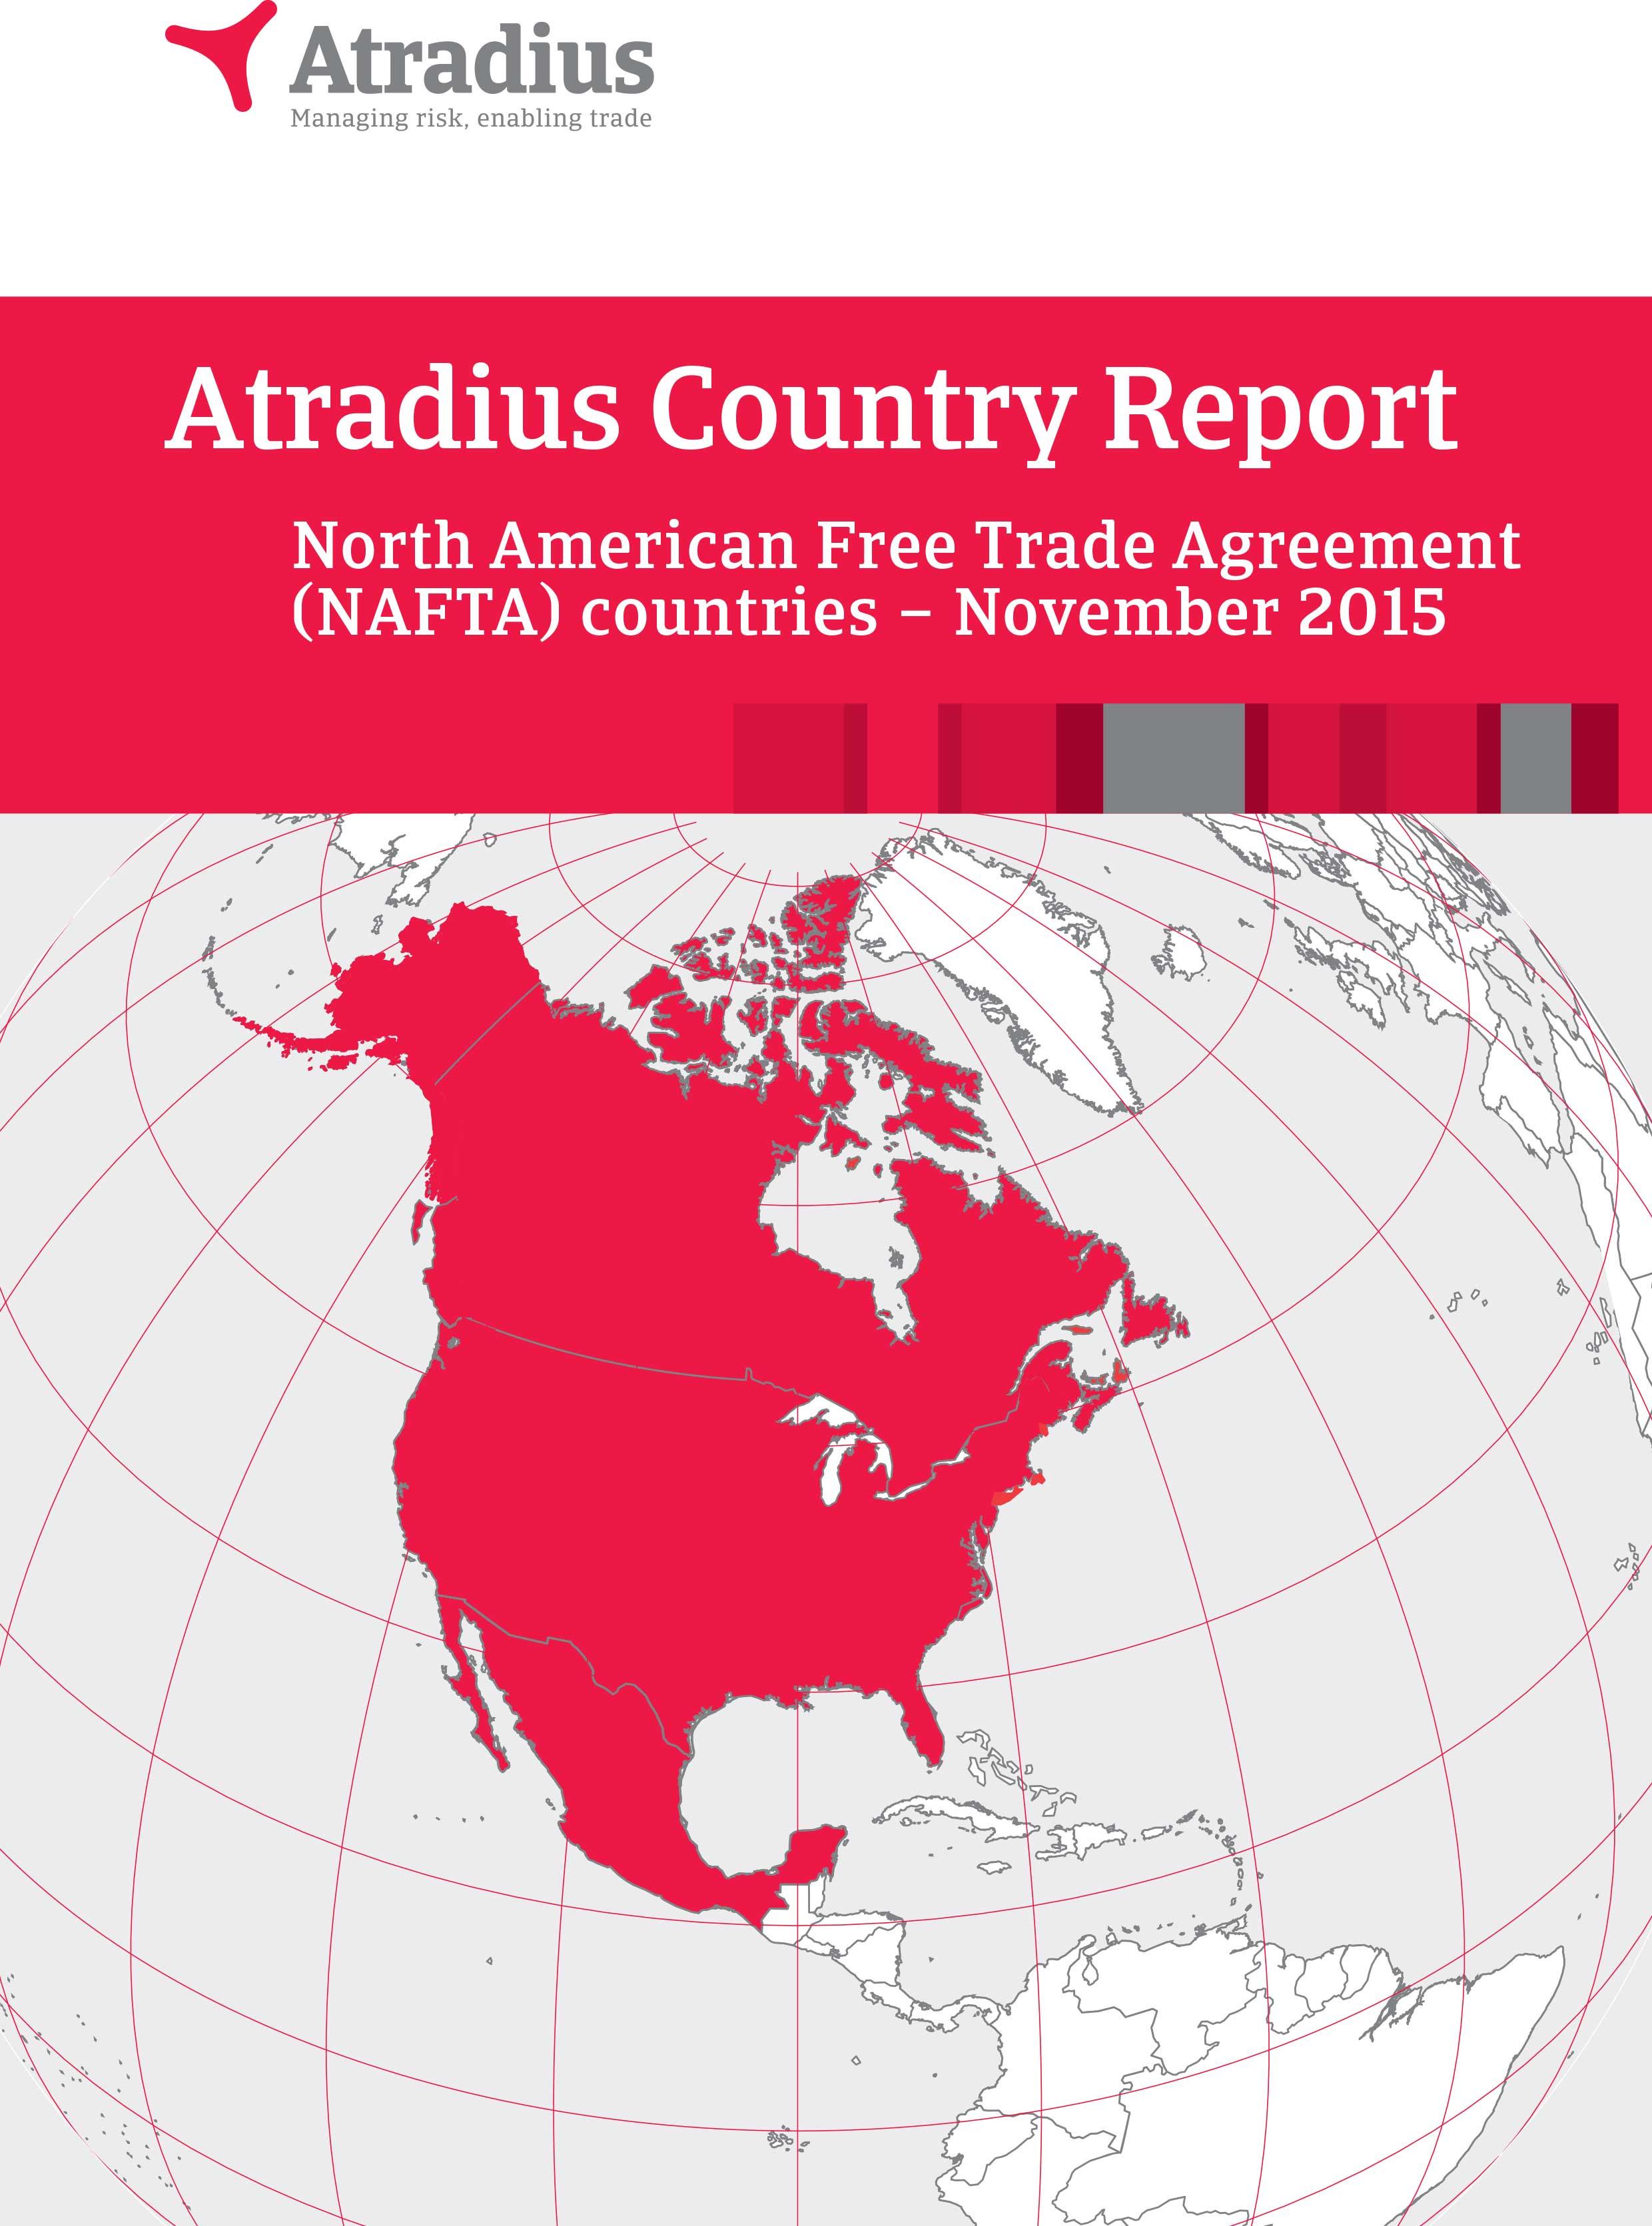 Country_Report_NAFTA_2015_CRNAFTA1501en